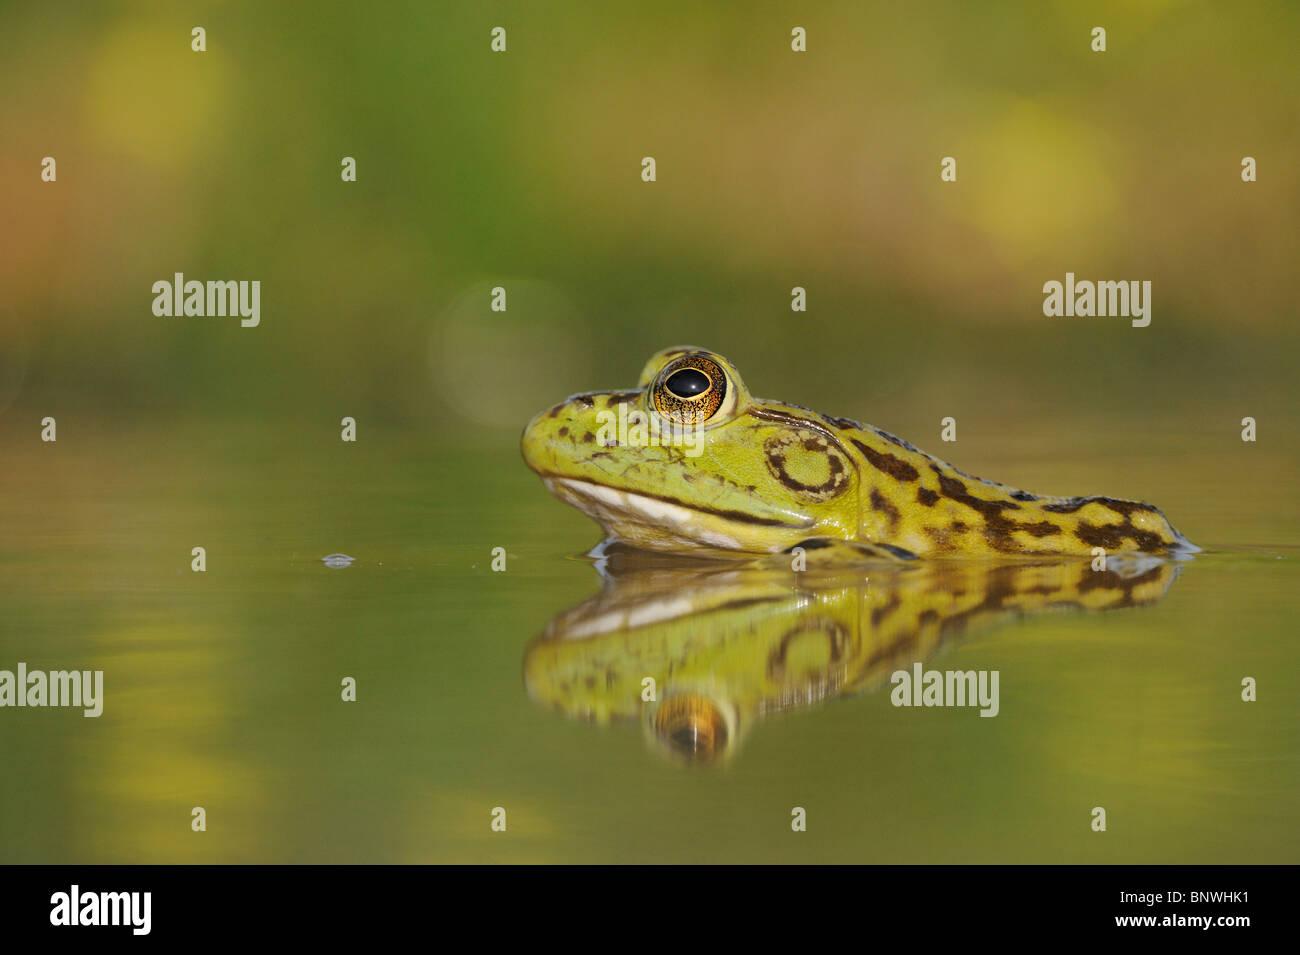 Bullfrog (Rana catesbeiana), adult in lake, Fennessey Ranch, Refugio, Coastal Bend, Texas Coast, USA Stock Photo